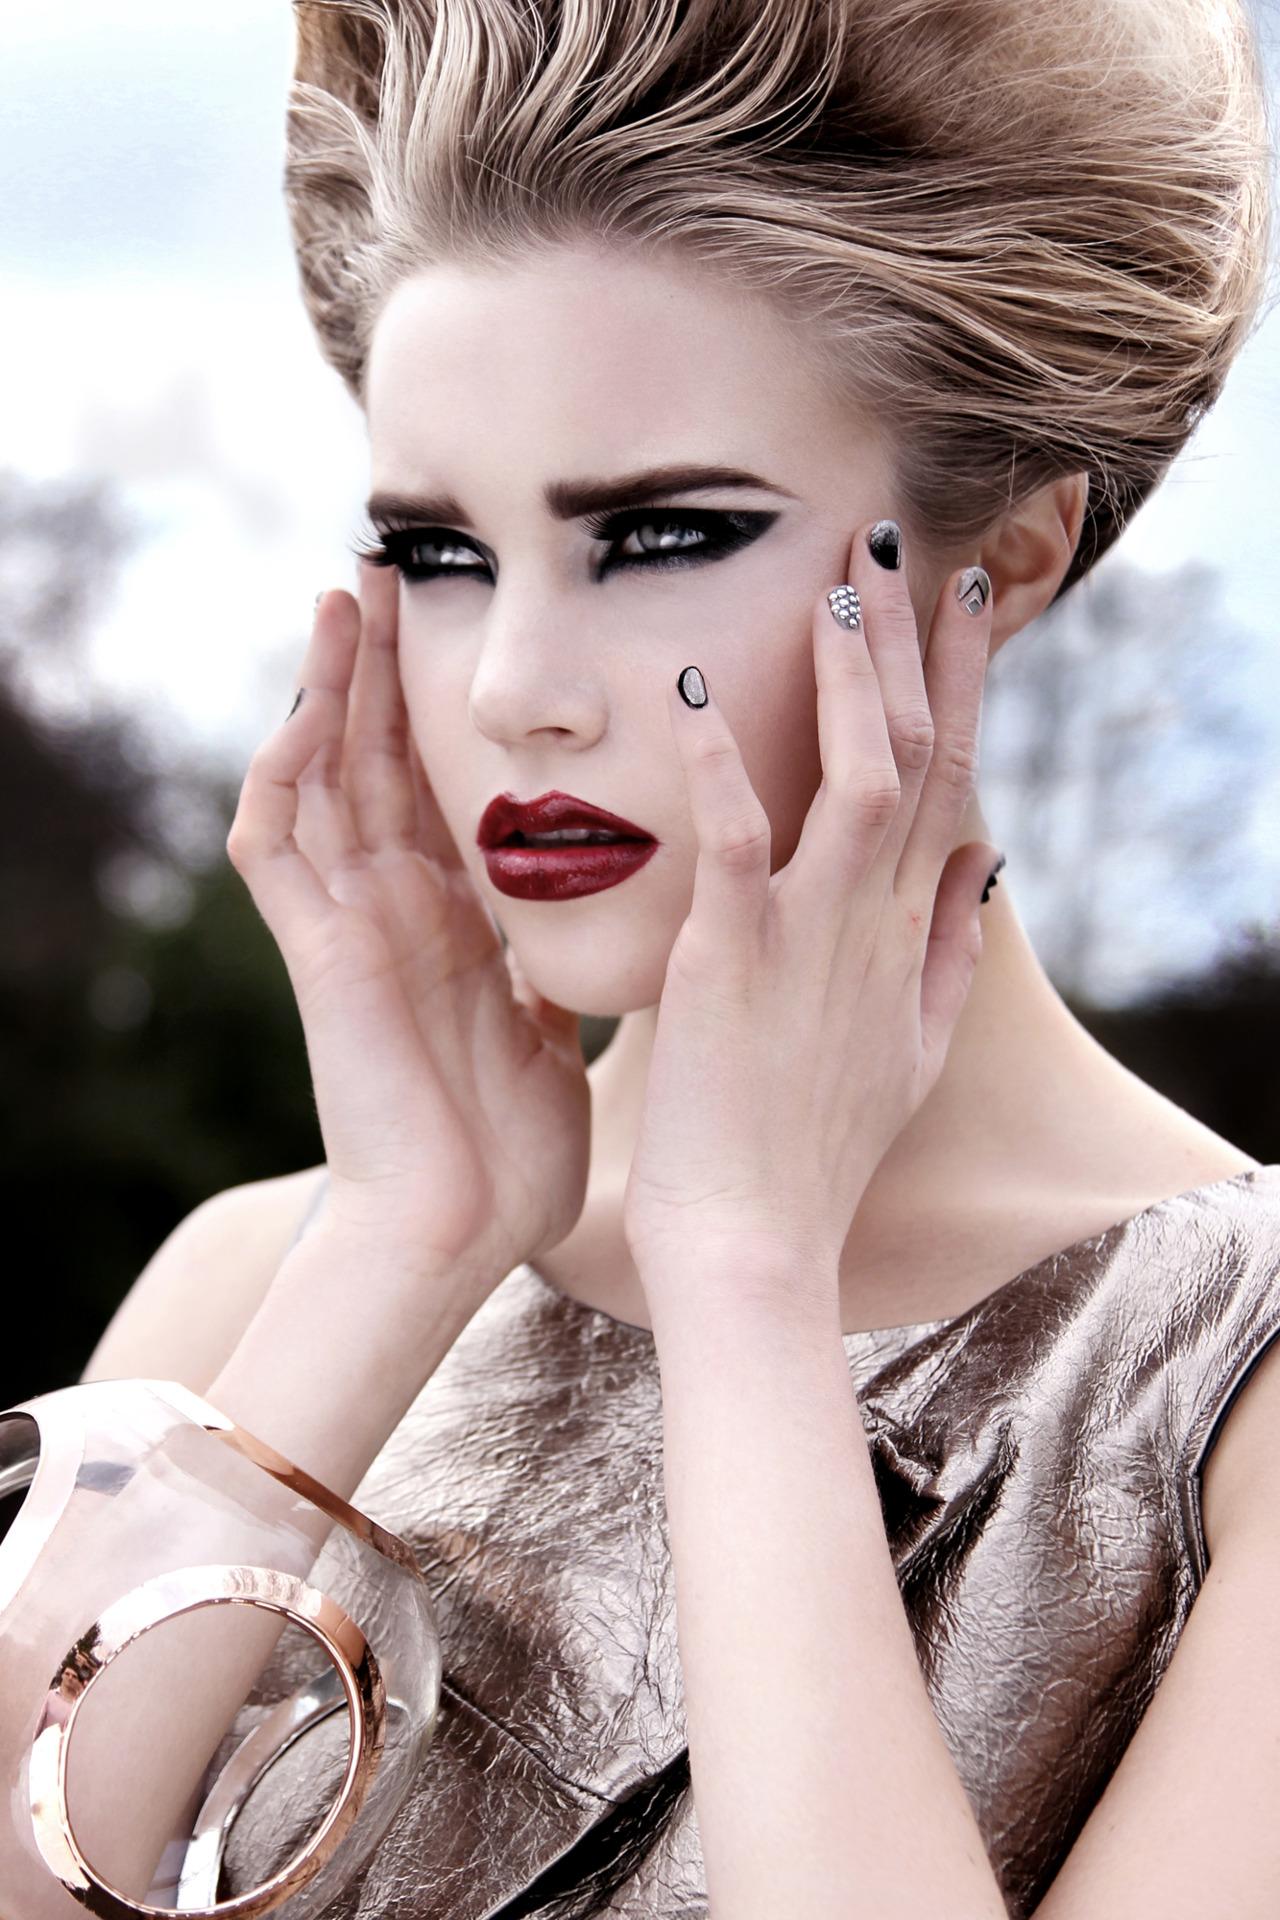 Makeup Wallpaper: Makeup Artists Wallpapers High Quality